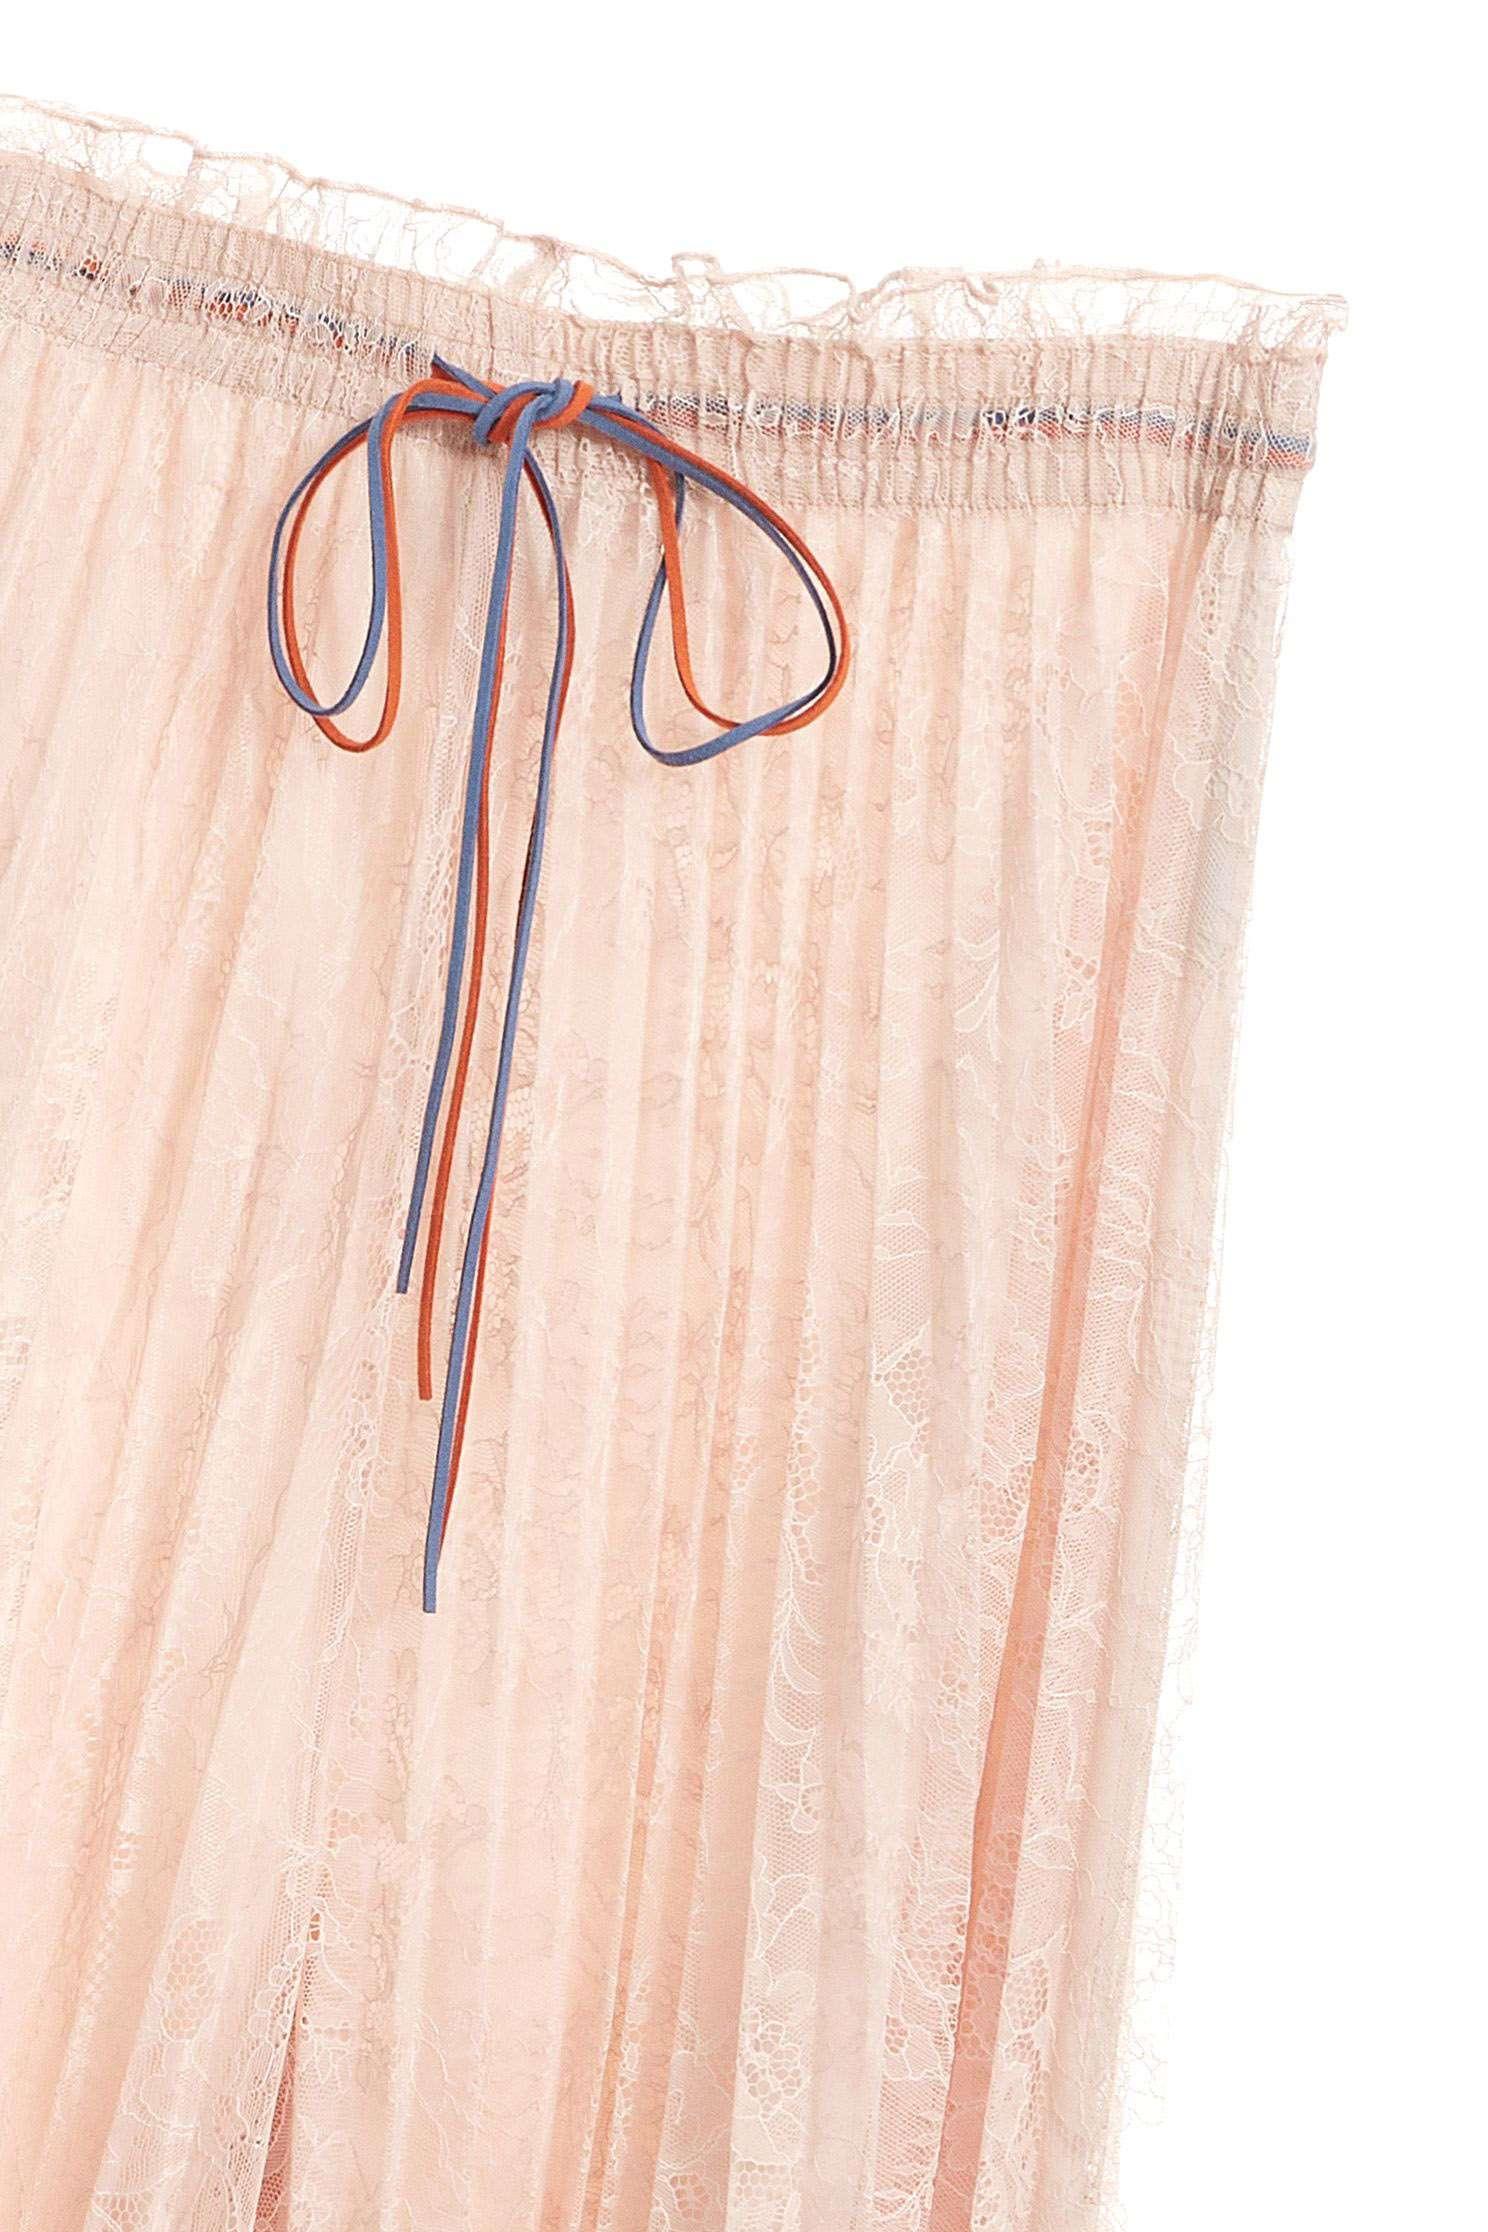 Elegant fashion wide pants,Culottes Pants,i-select,Lace,Pants,Culottes,長褲,Was thin